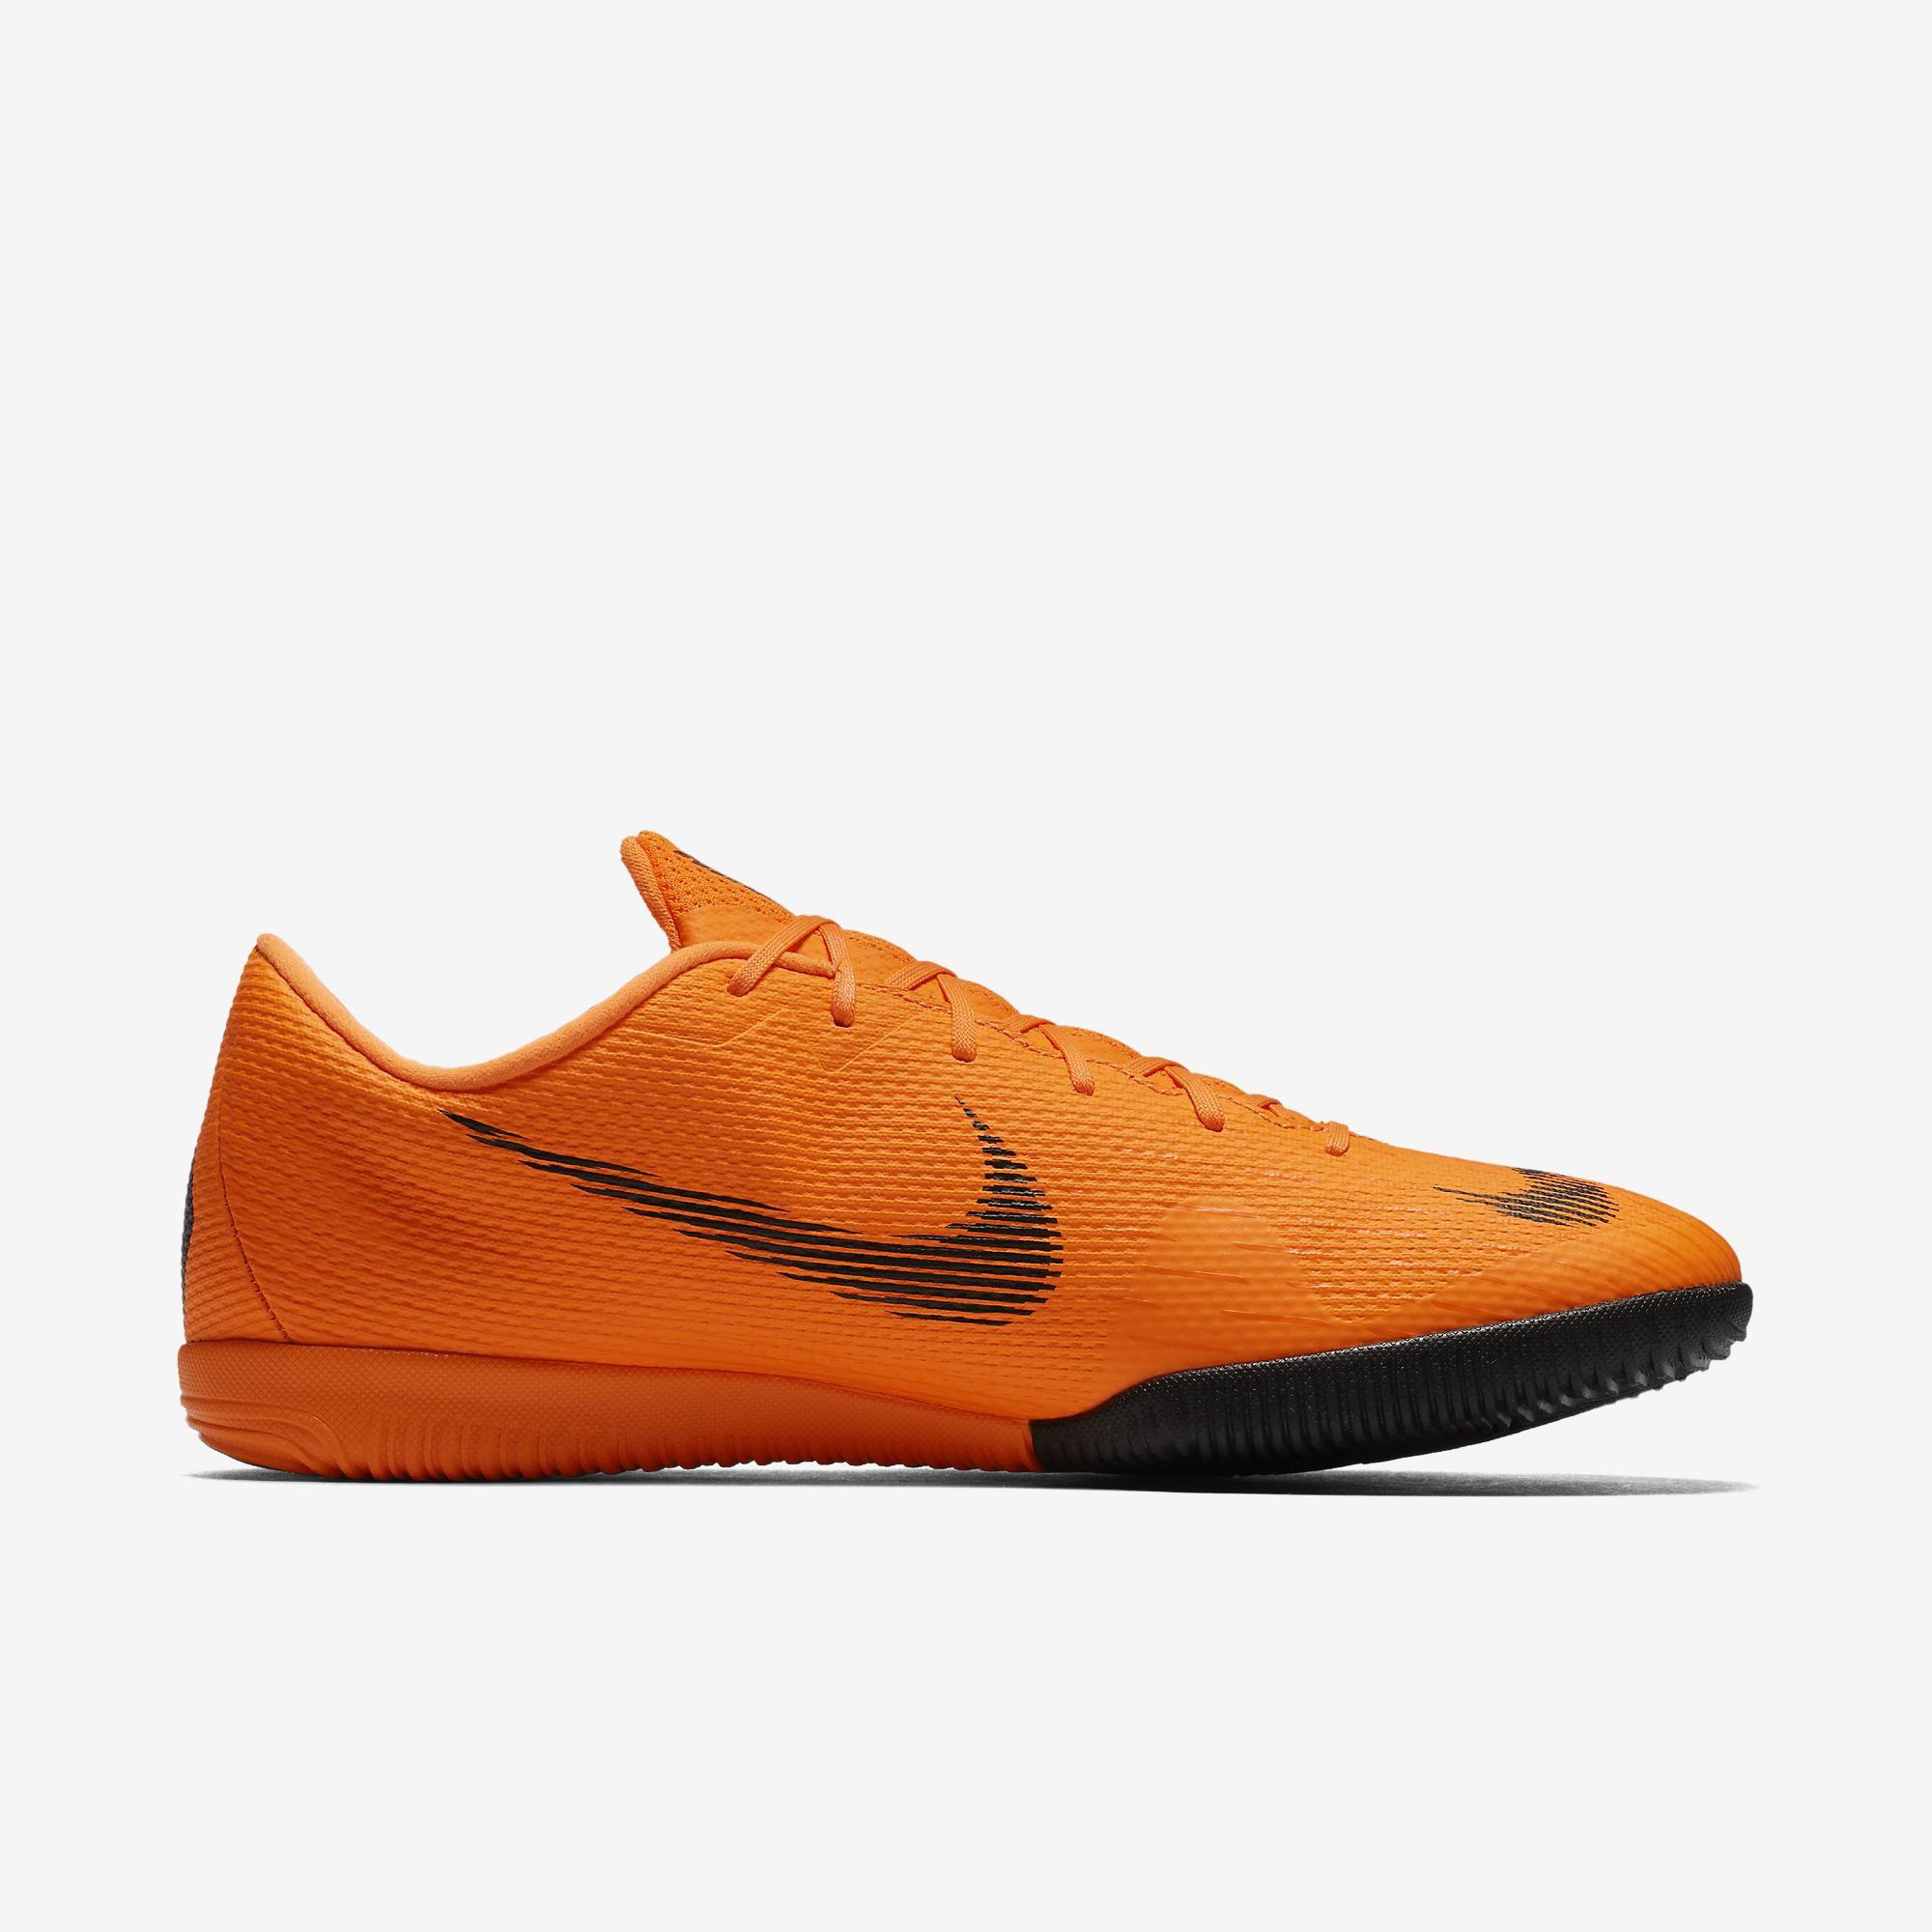 31d80e9842a Chuteira Futsal Nike Ah7383 Mercurial Vaporx 12 Academy - BRACIA SHOP  Loja  de Roupas